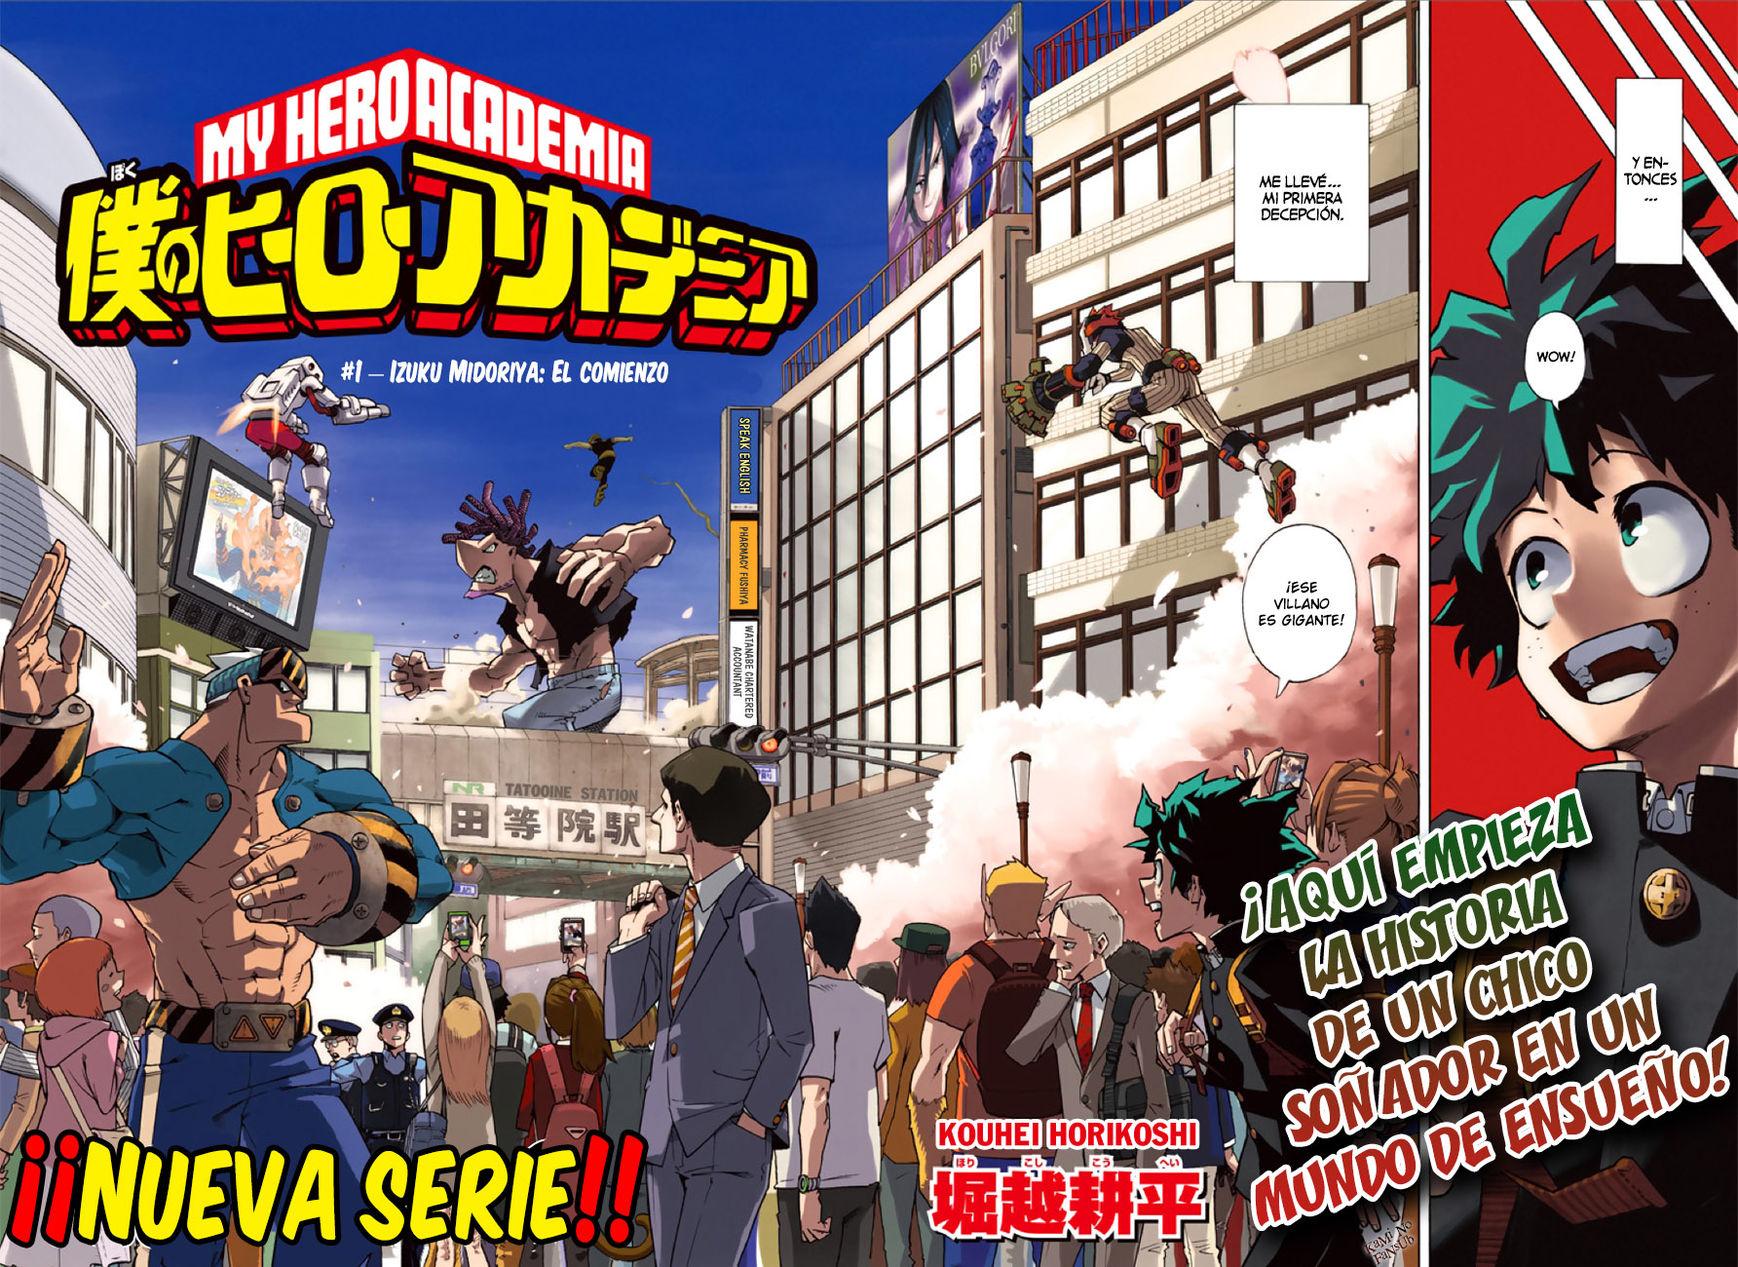 http://c5.ninemanga.com/es_manga/54/182/384252/383d3906a81567a4790639391dc4ecd7.jpg Page 4